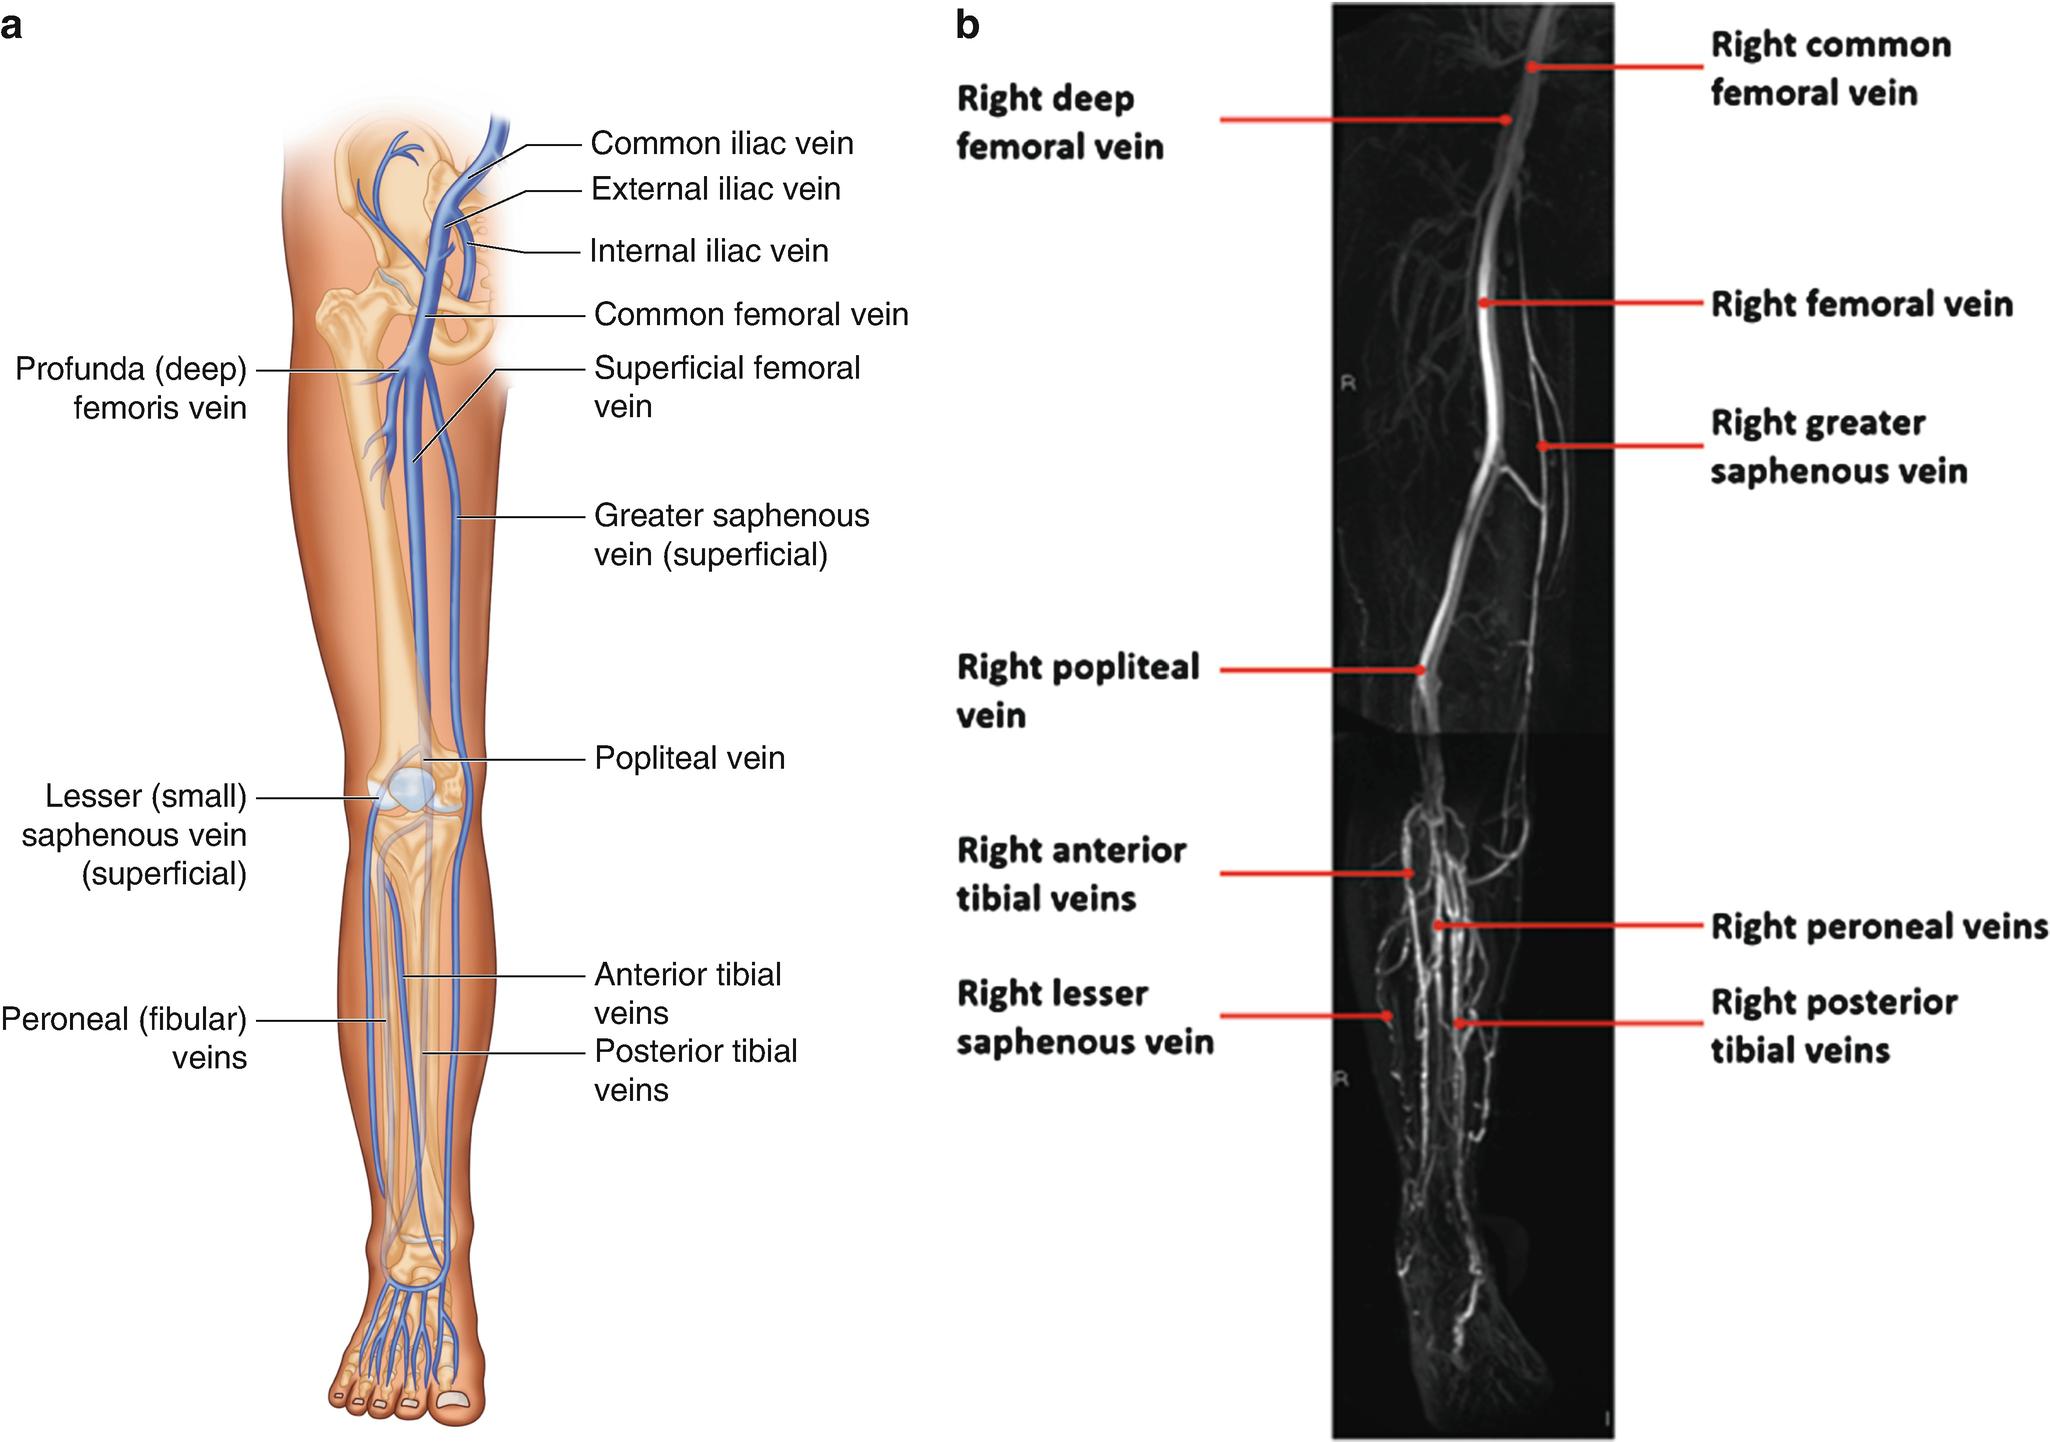 Modern Femoral Vein Anatomy Adornment - Anatomy and Physiology ...